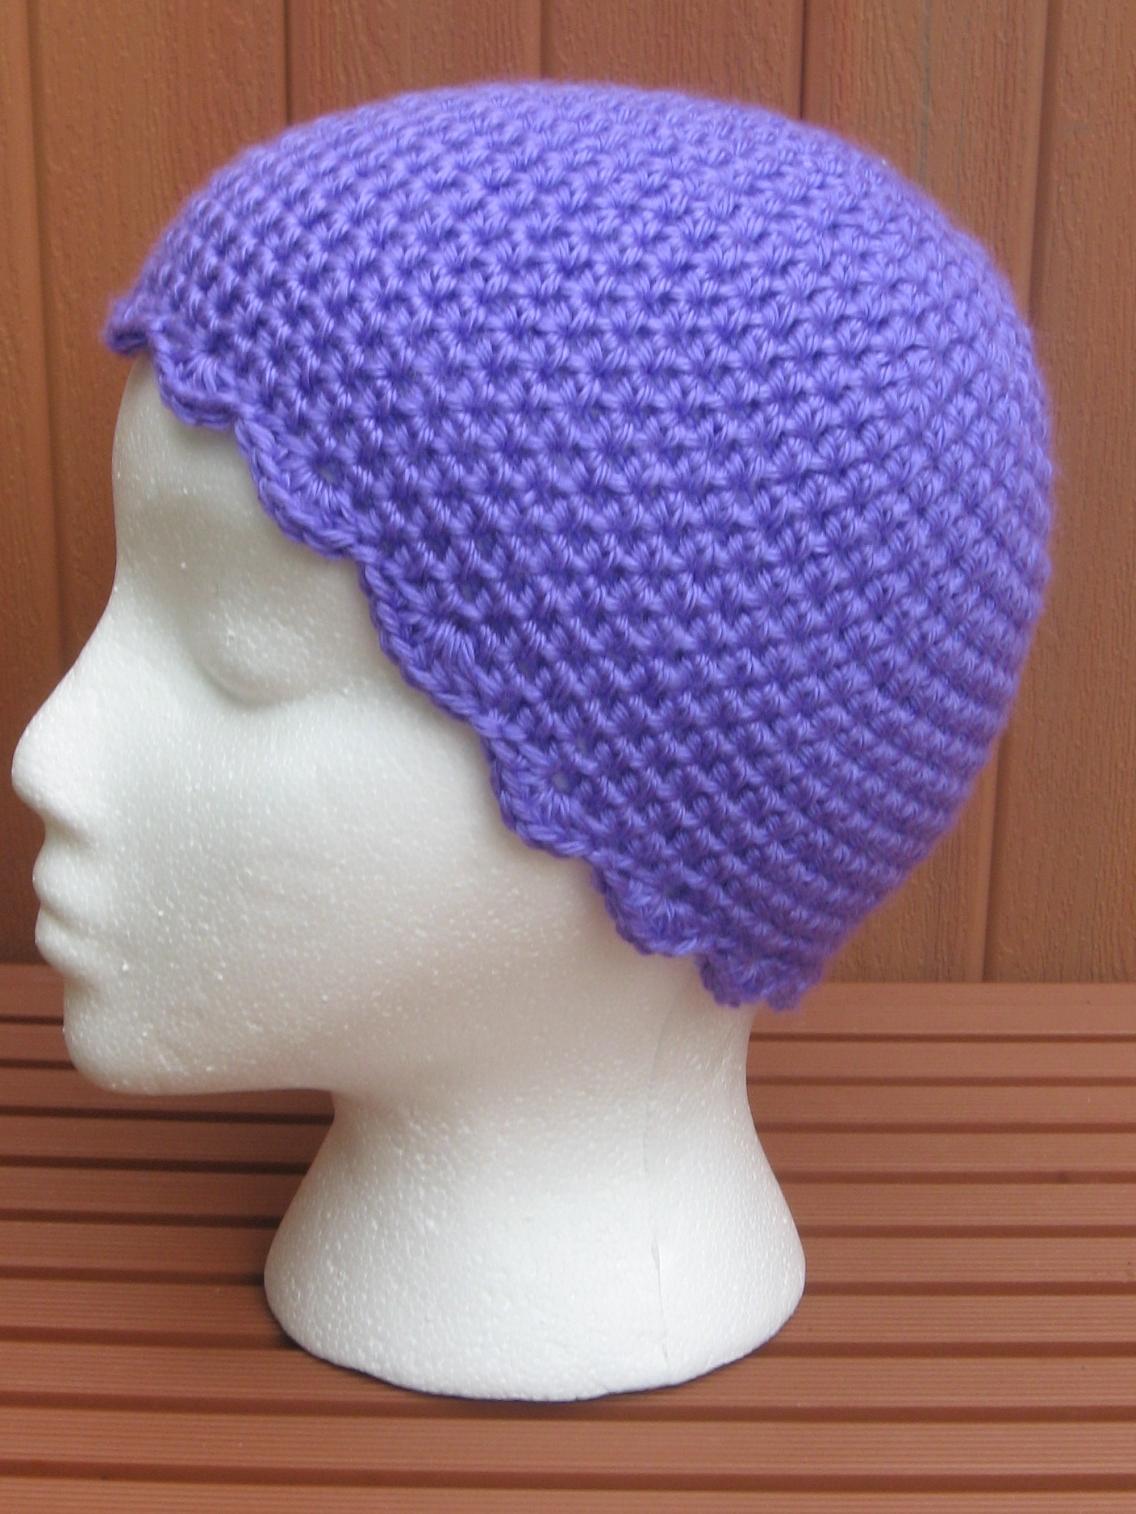 Free Crochet Chemo Hat Patterns newhairstylesformen2014.com